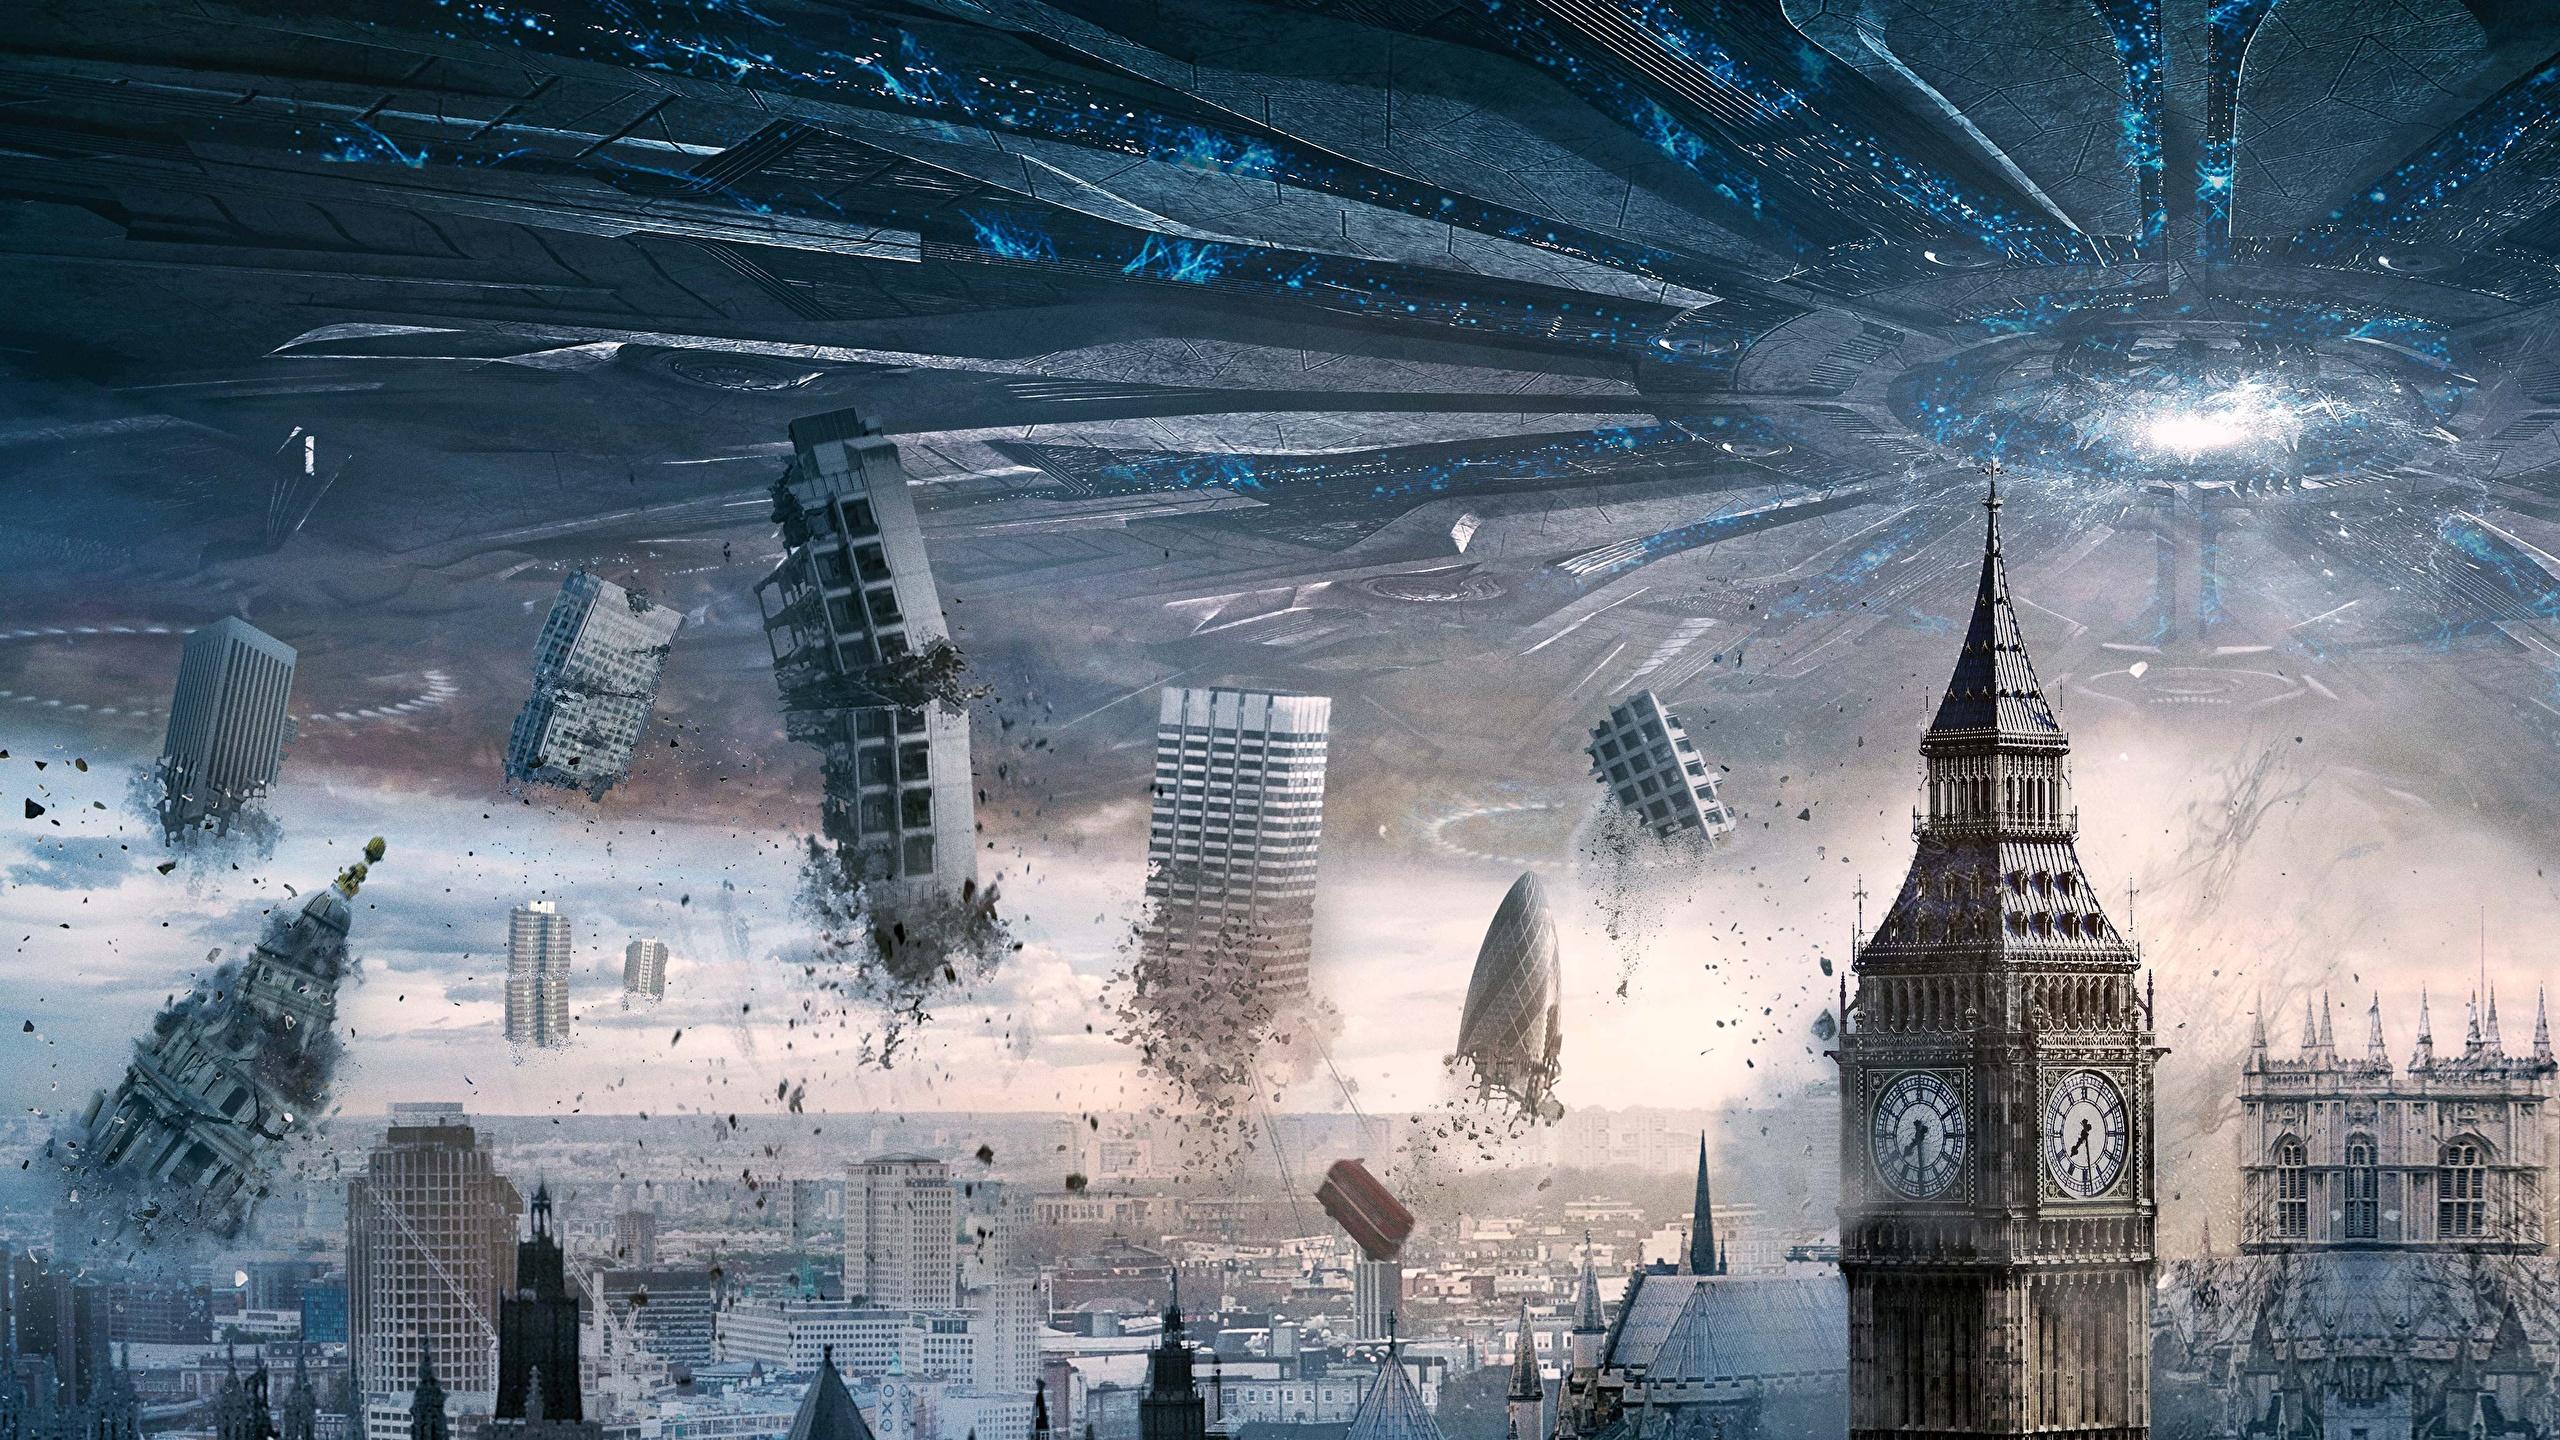 Fonds D Ecran 2560x1440 Technique Fantasy Catastrophes Angleterre Independence Day Resurgence Big Ben Ovni Cinema Telecharger Photo